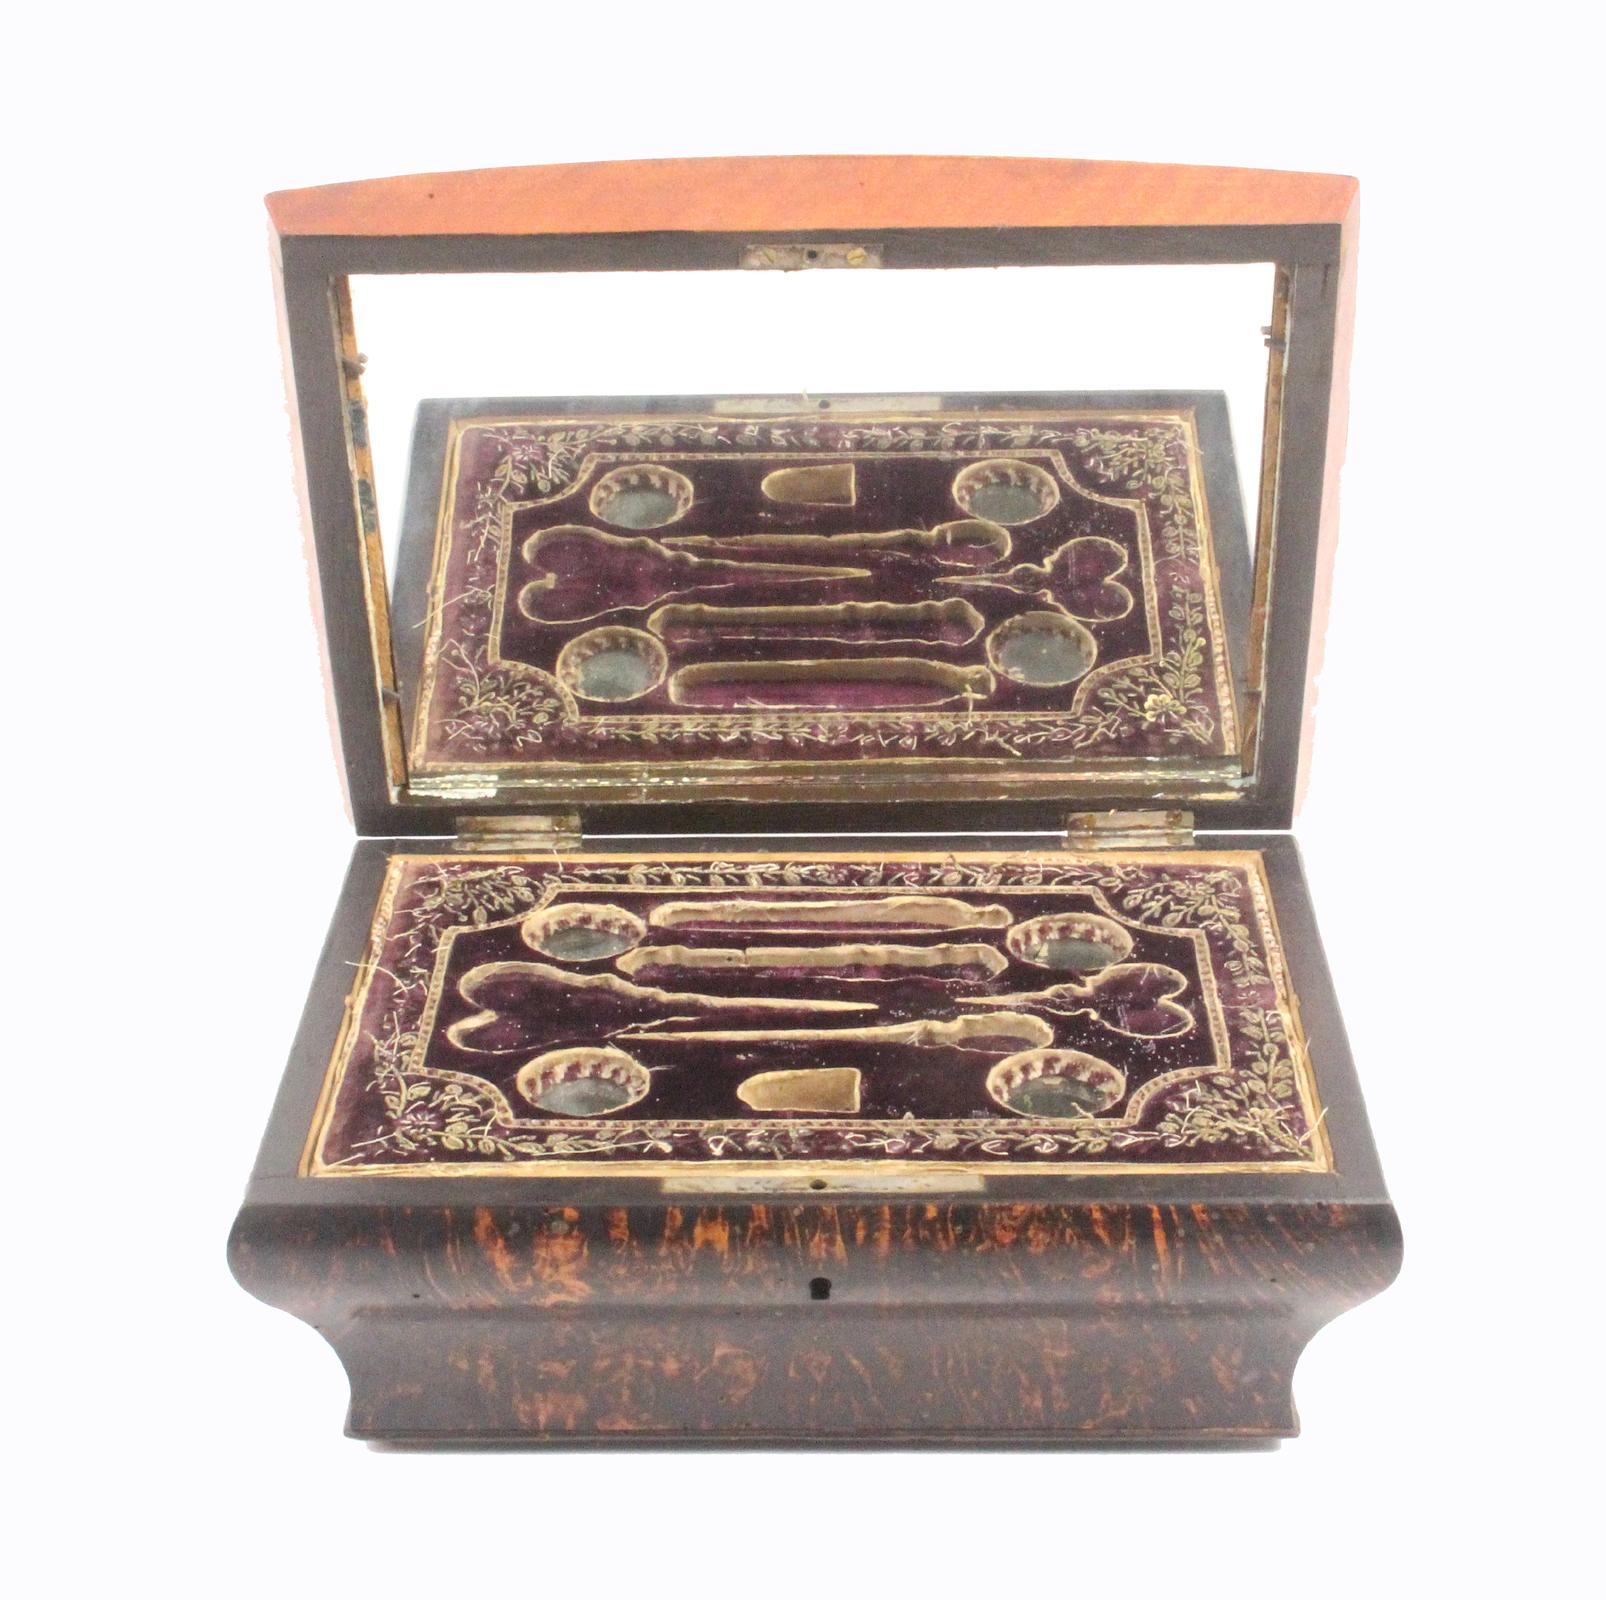 A Palais Royal Burr Ash Sewing Box, Circa 1820, The Bombe